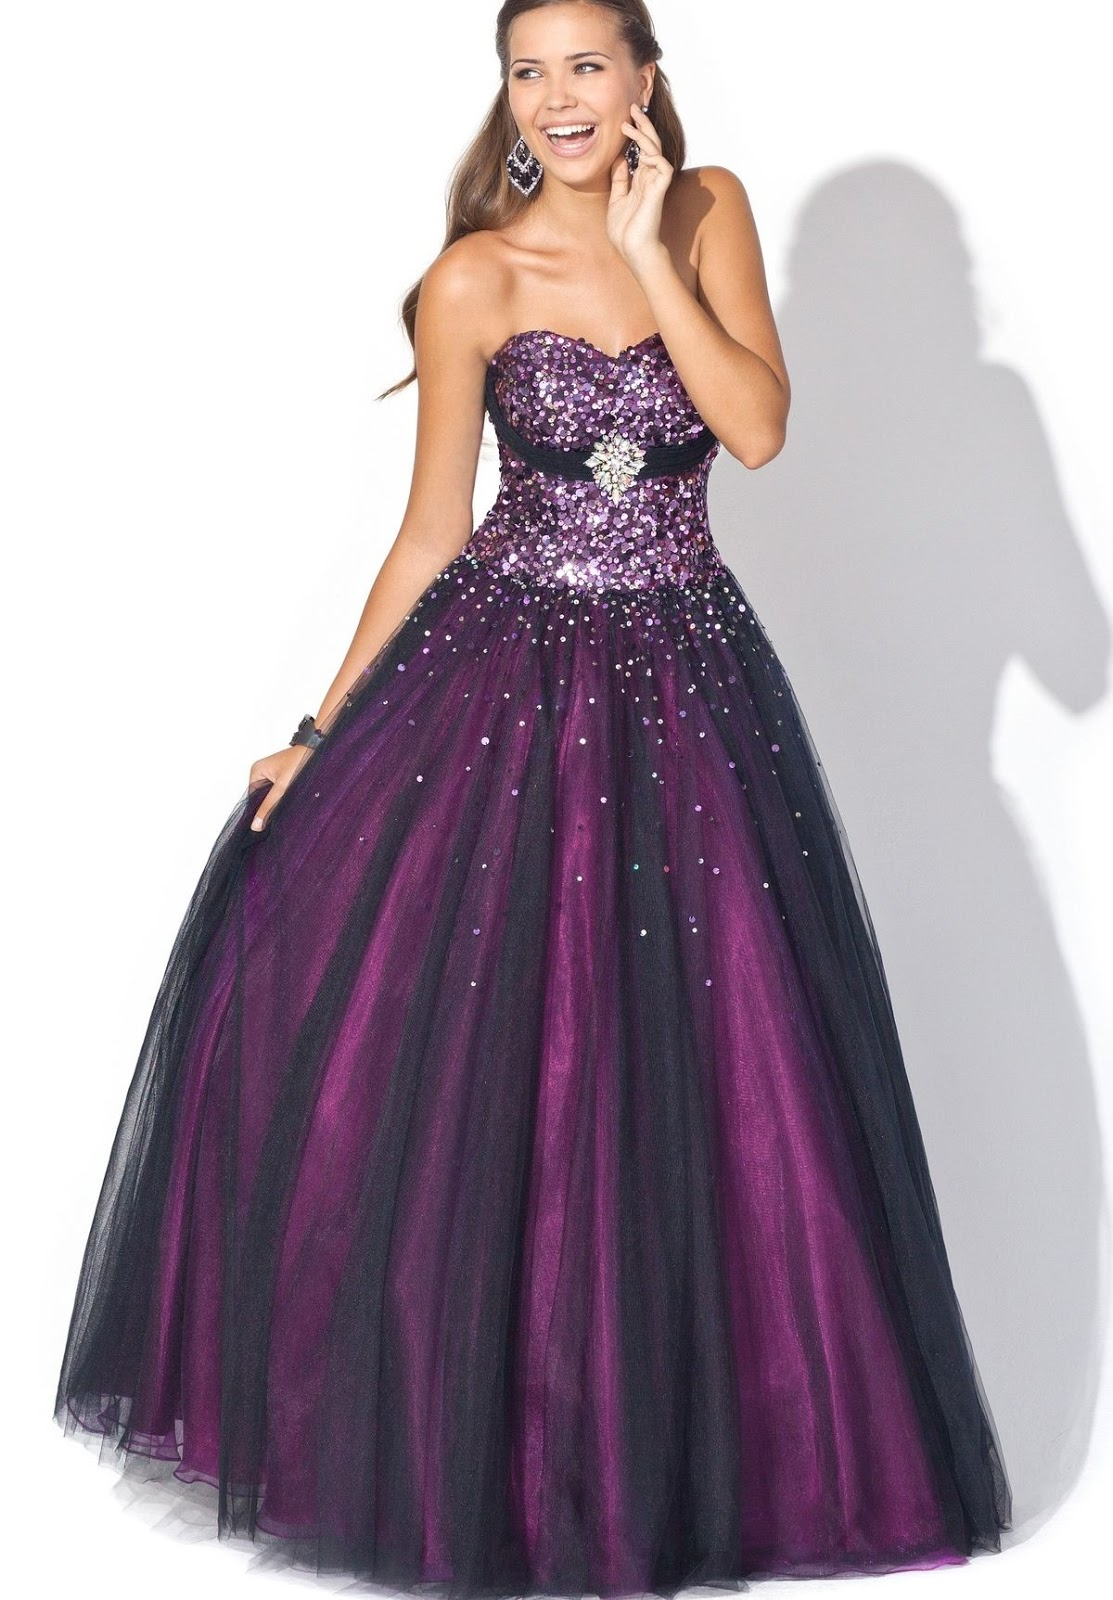 WhiteAzalea Ball Gowns: 2013 Stunning Purple Ball Gown ...